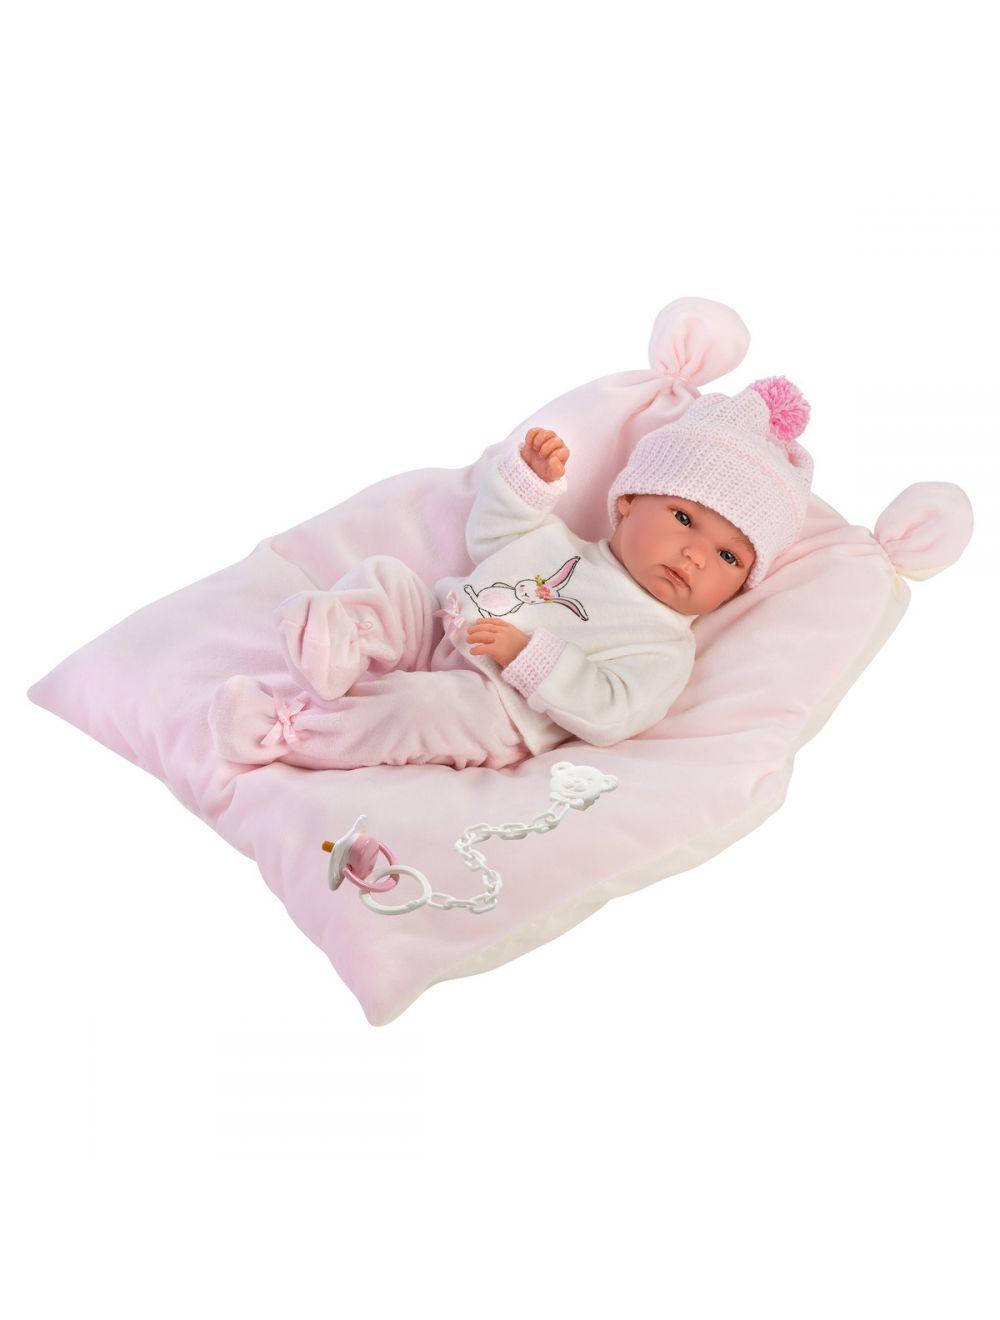 Llorens 63556 Lalka bobas Bimba 35 cm na różowej poduszce FB